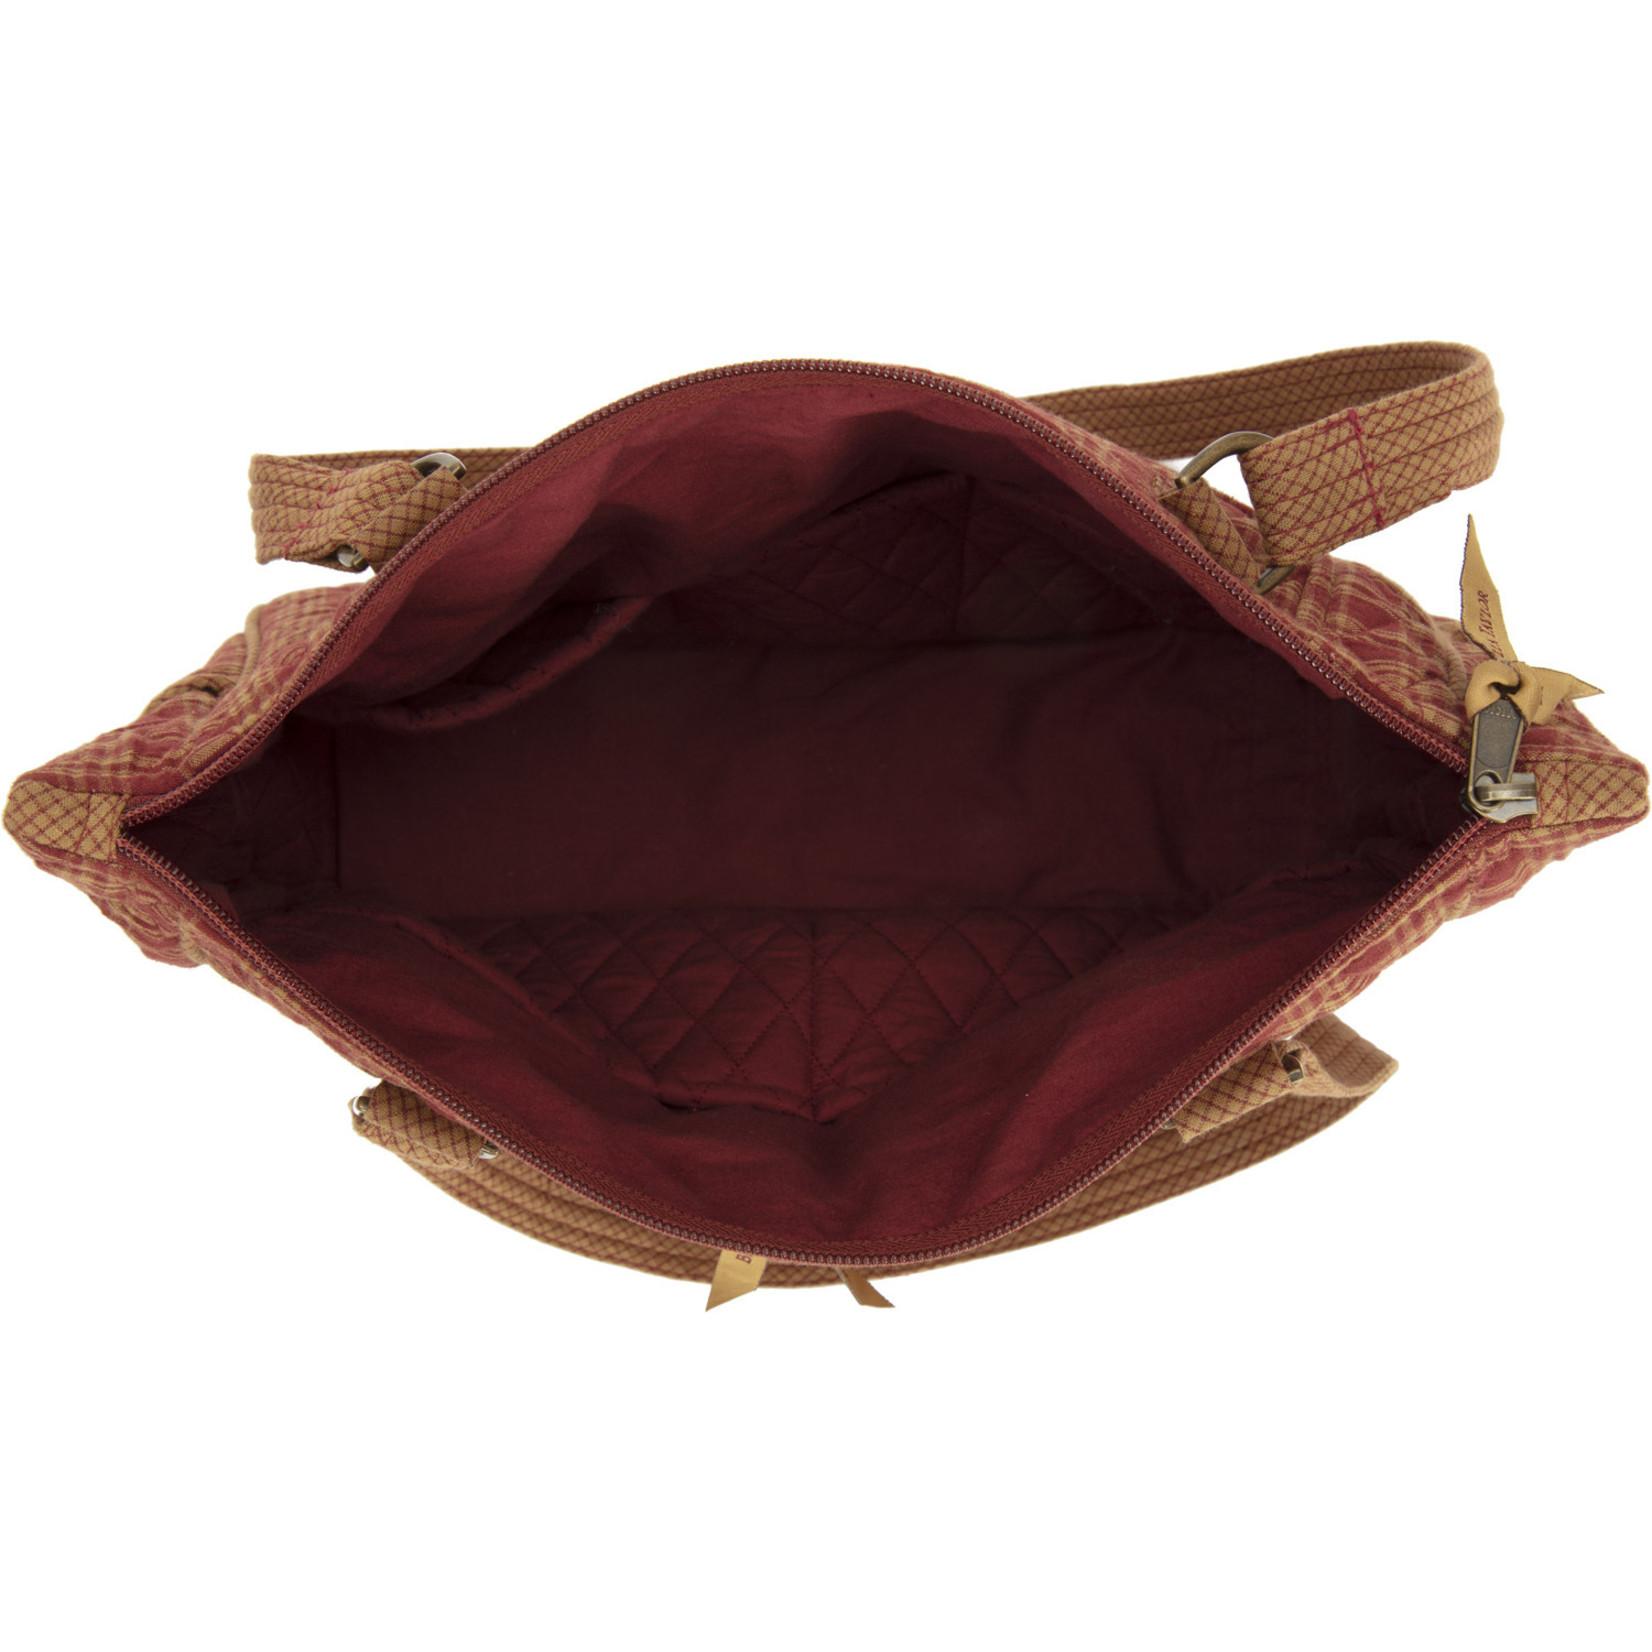 Bella Taylor Ninepatch Star - Everyday handbag